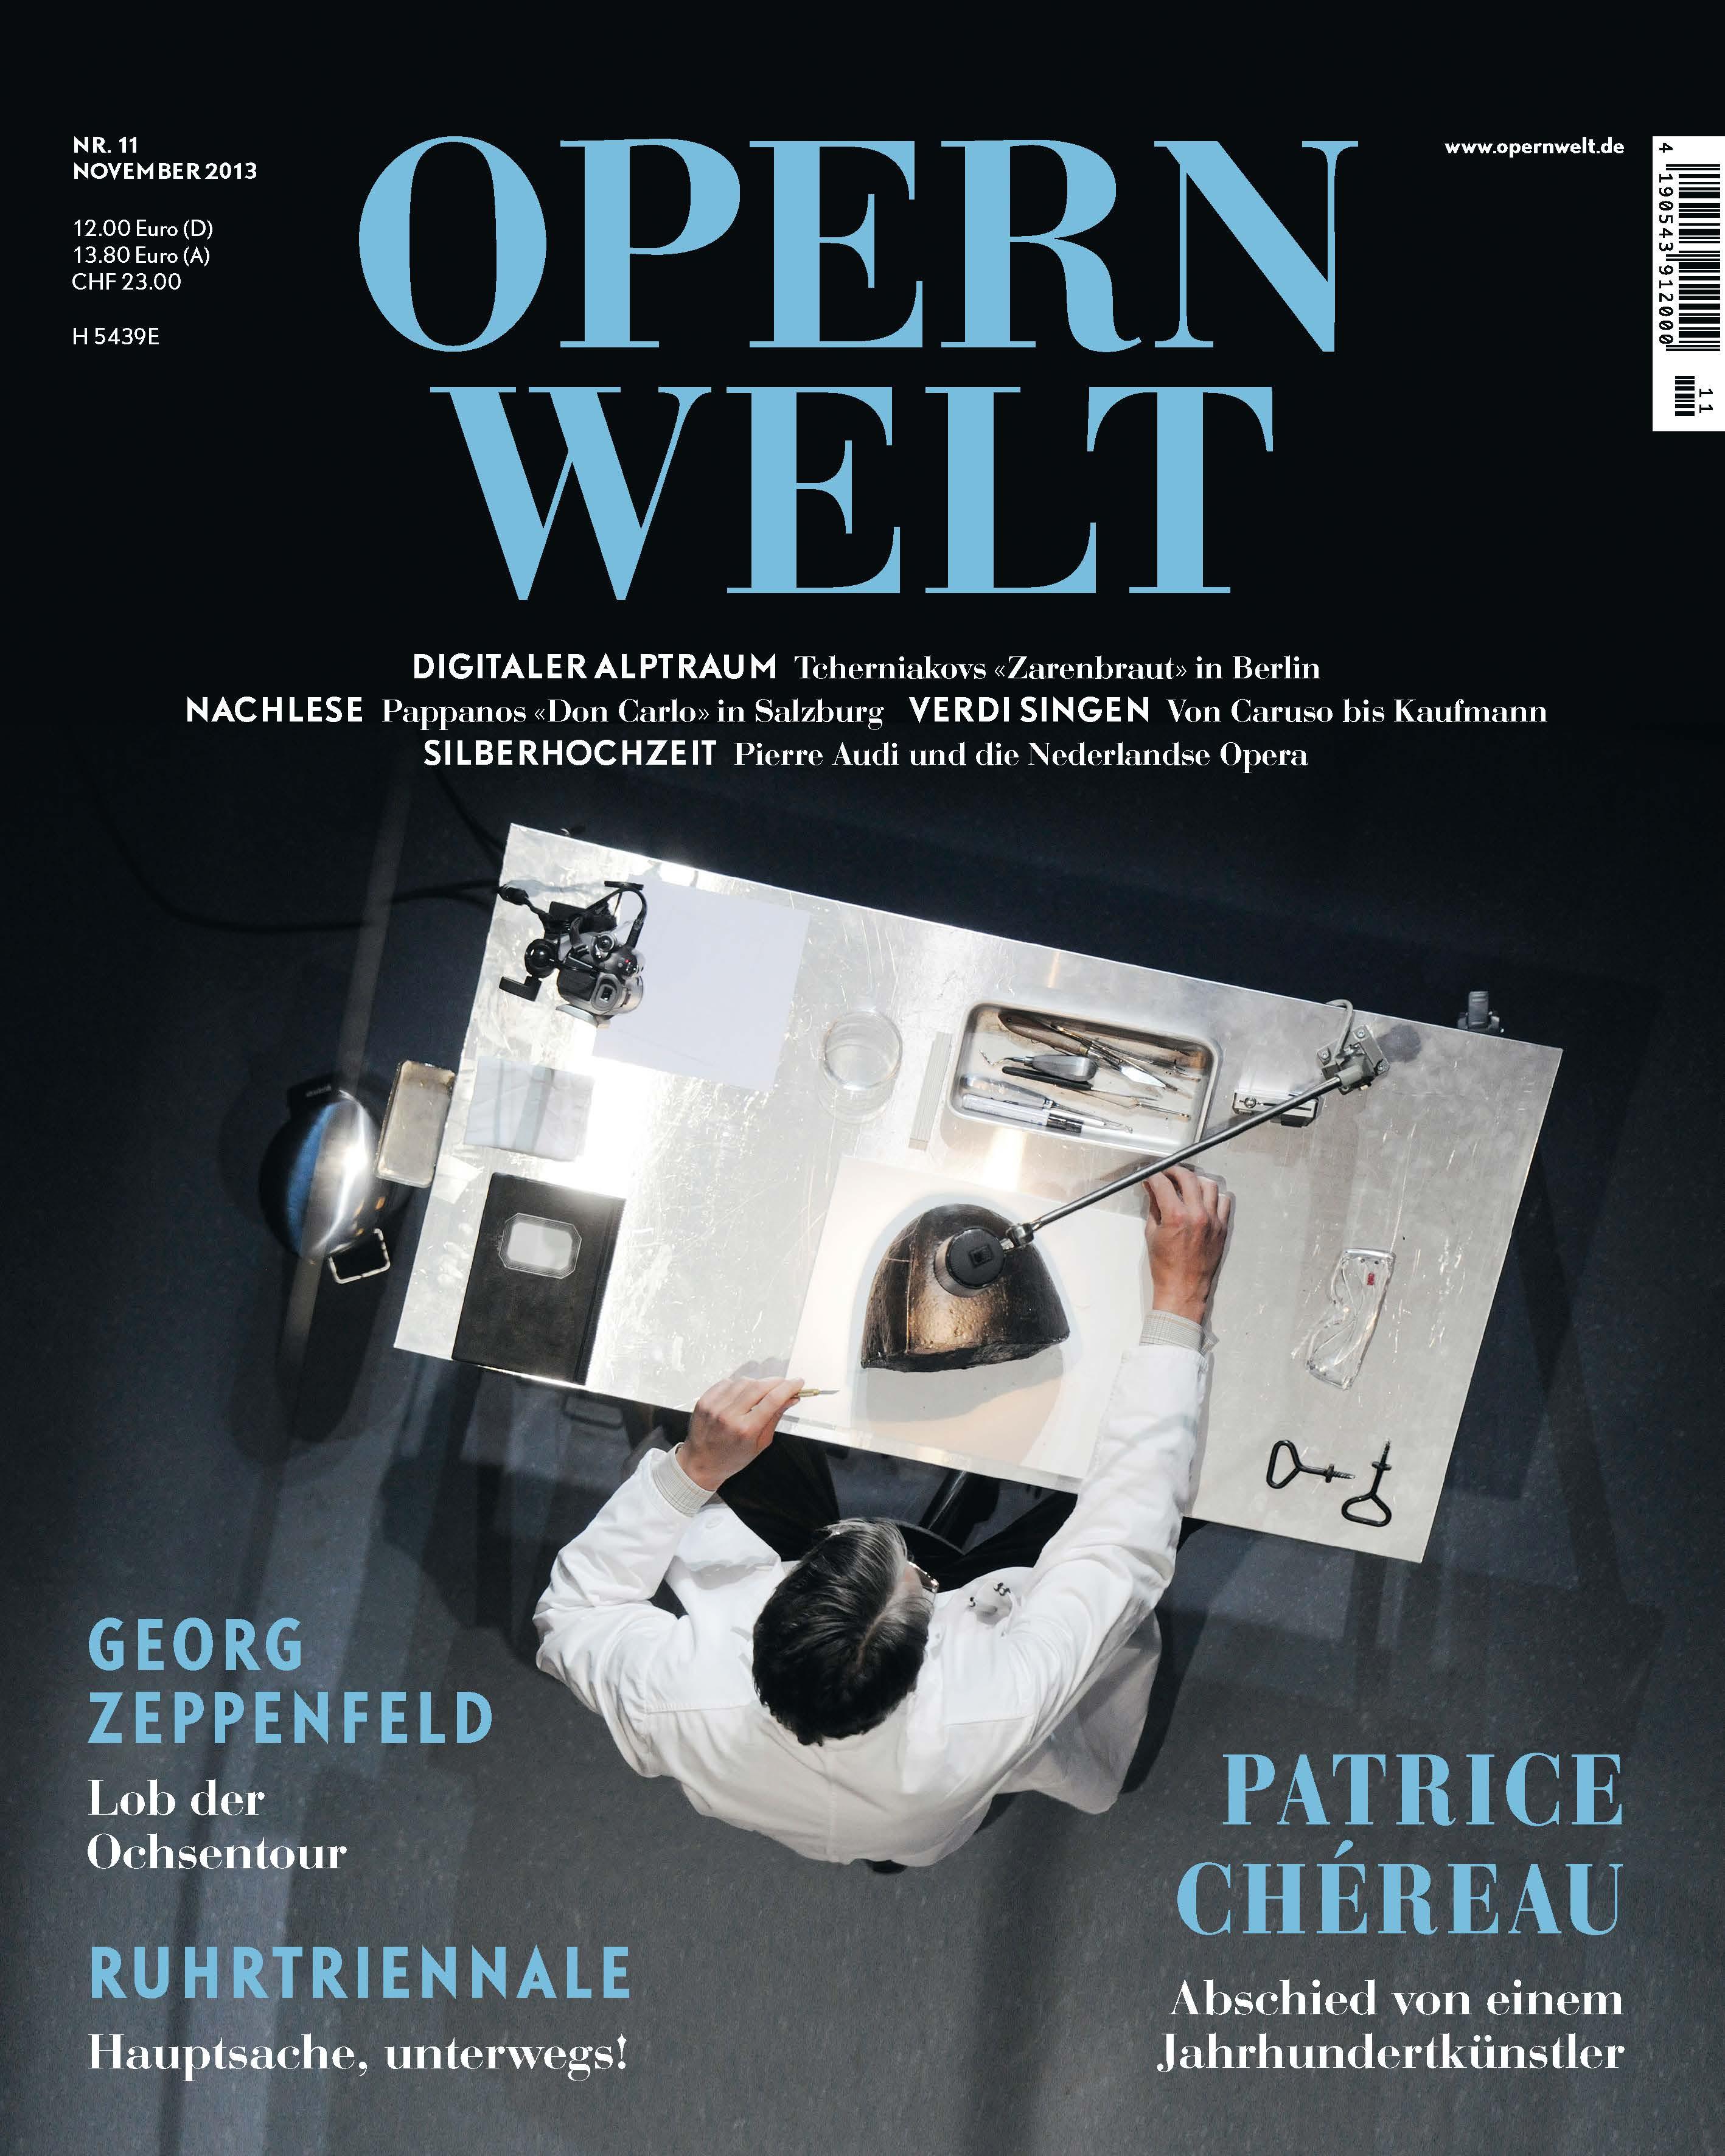 Opernwelt November 2013 (11/2013)